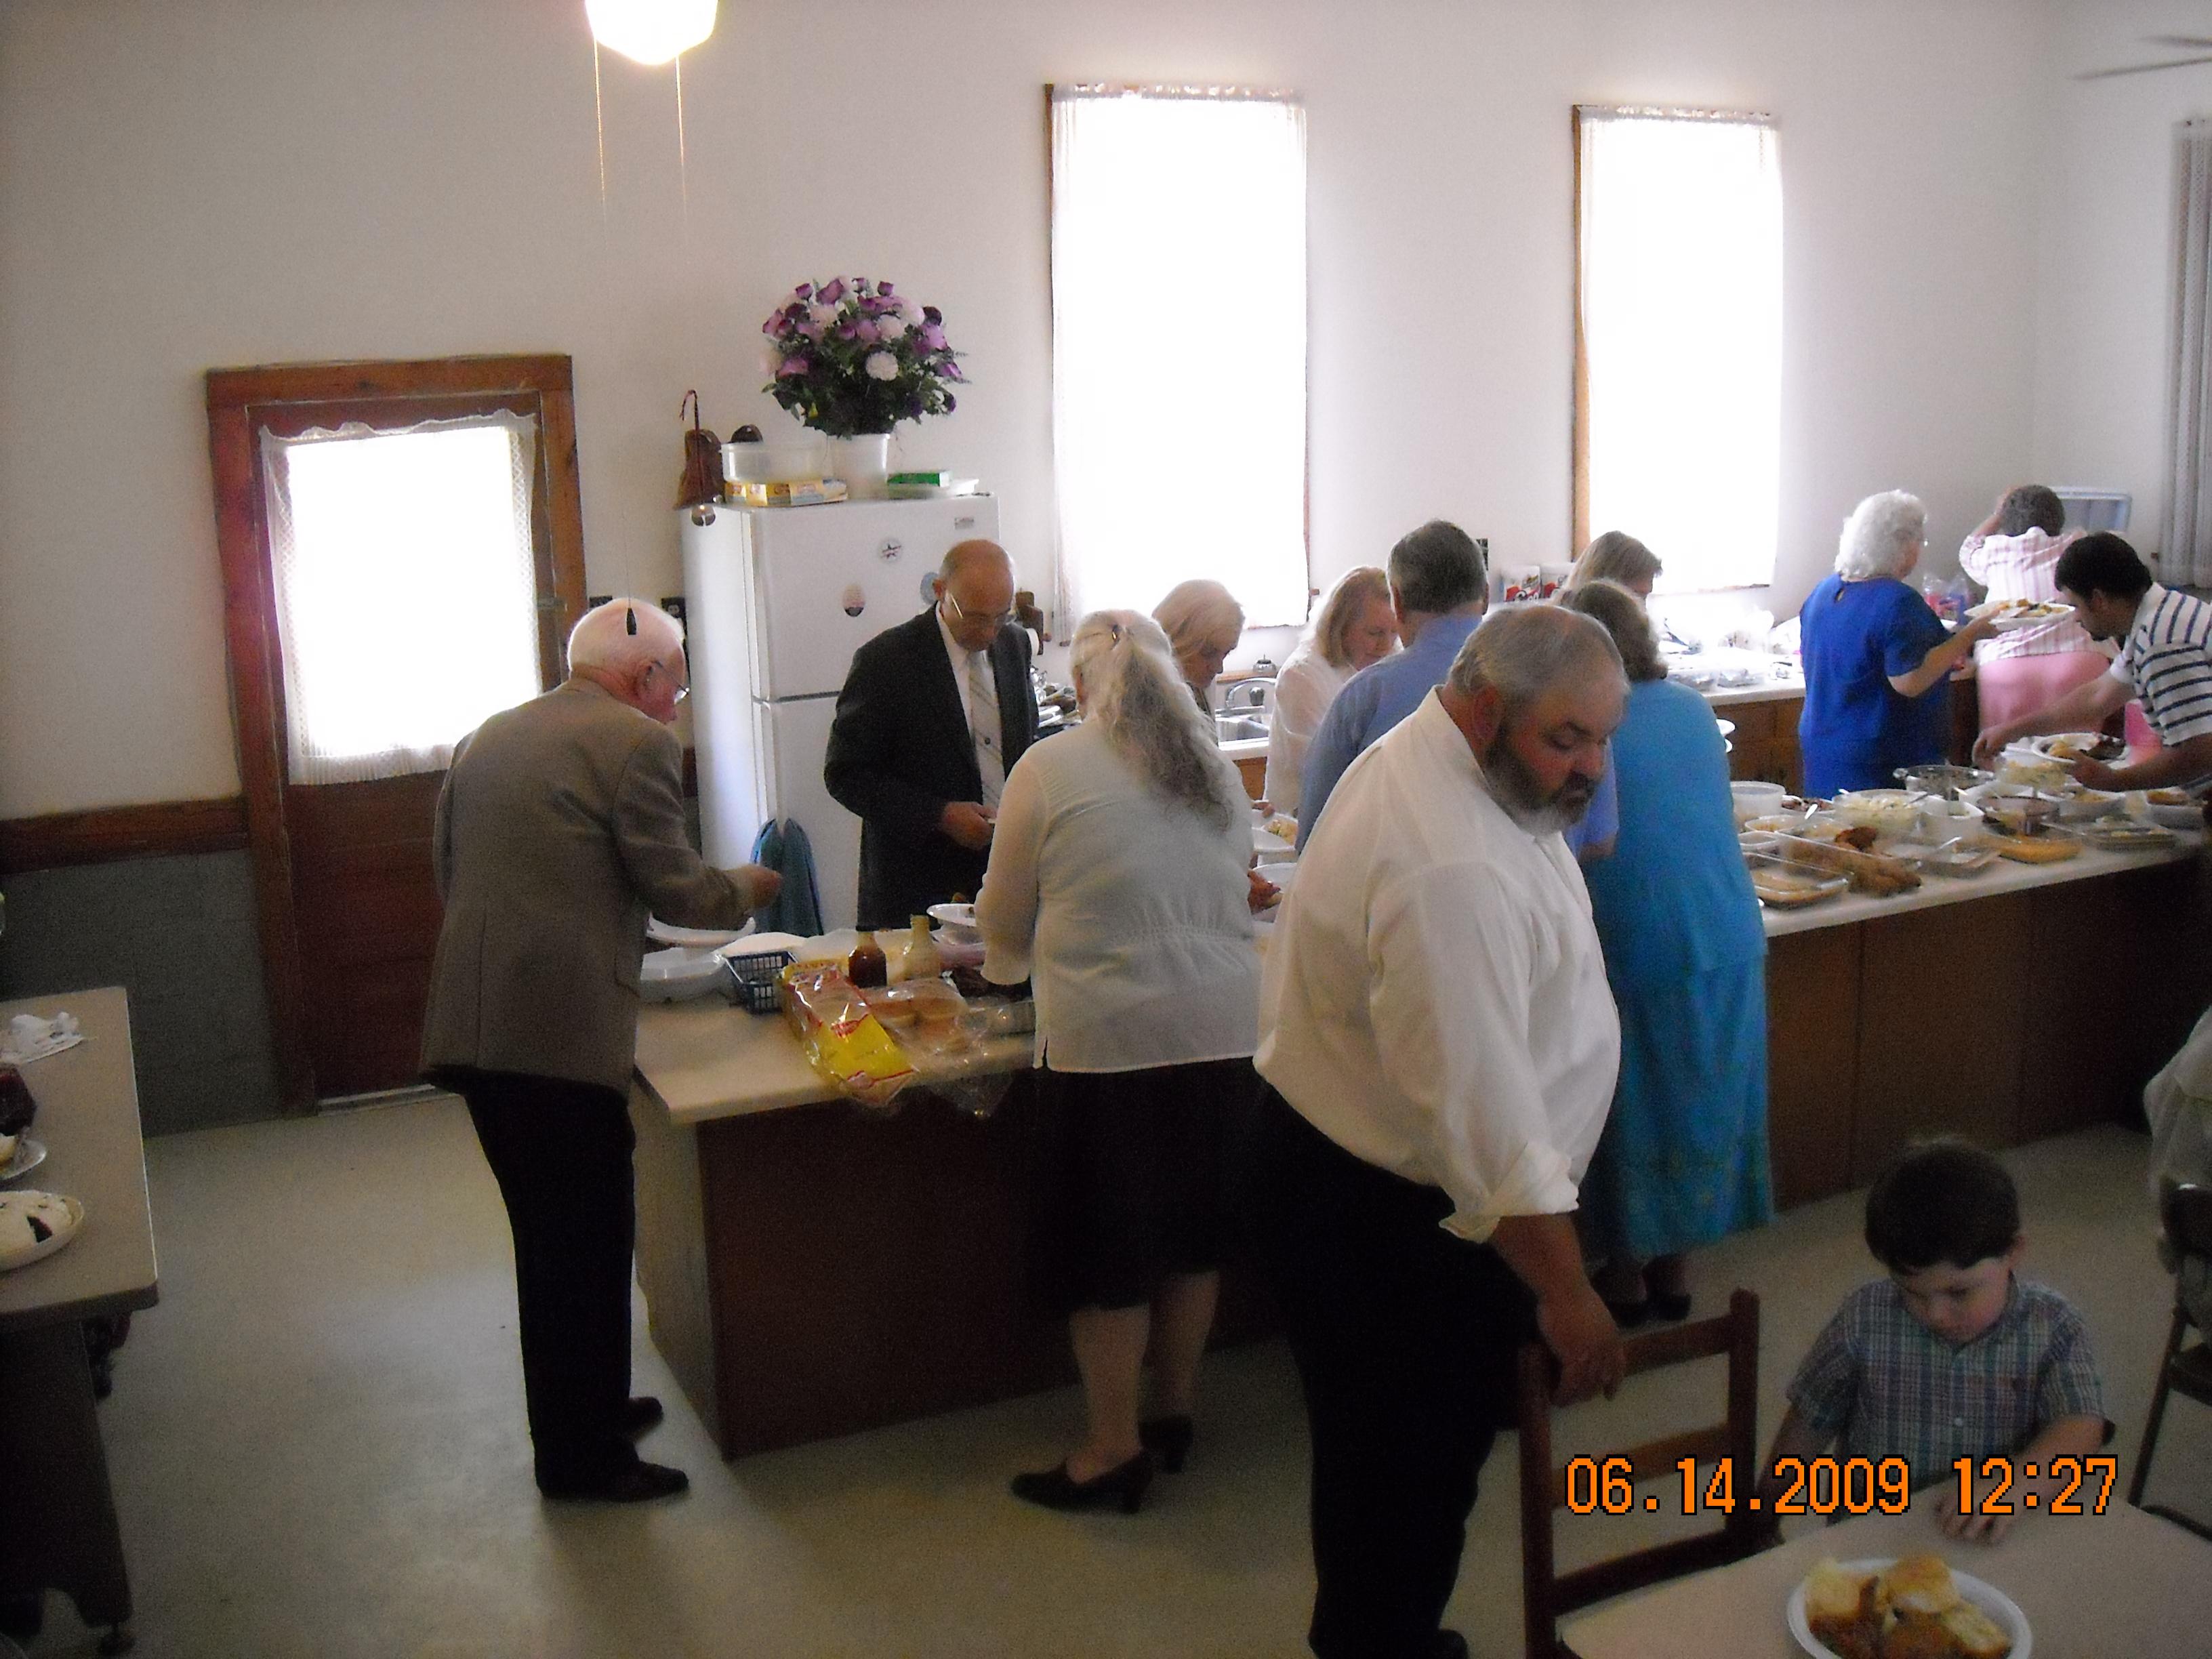 Stinchcomb Homecoming, June 14, 2009.jpeg 010